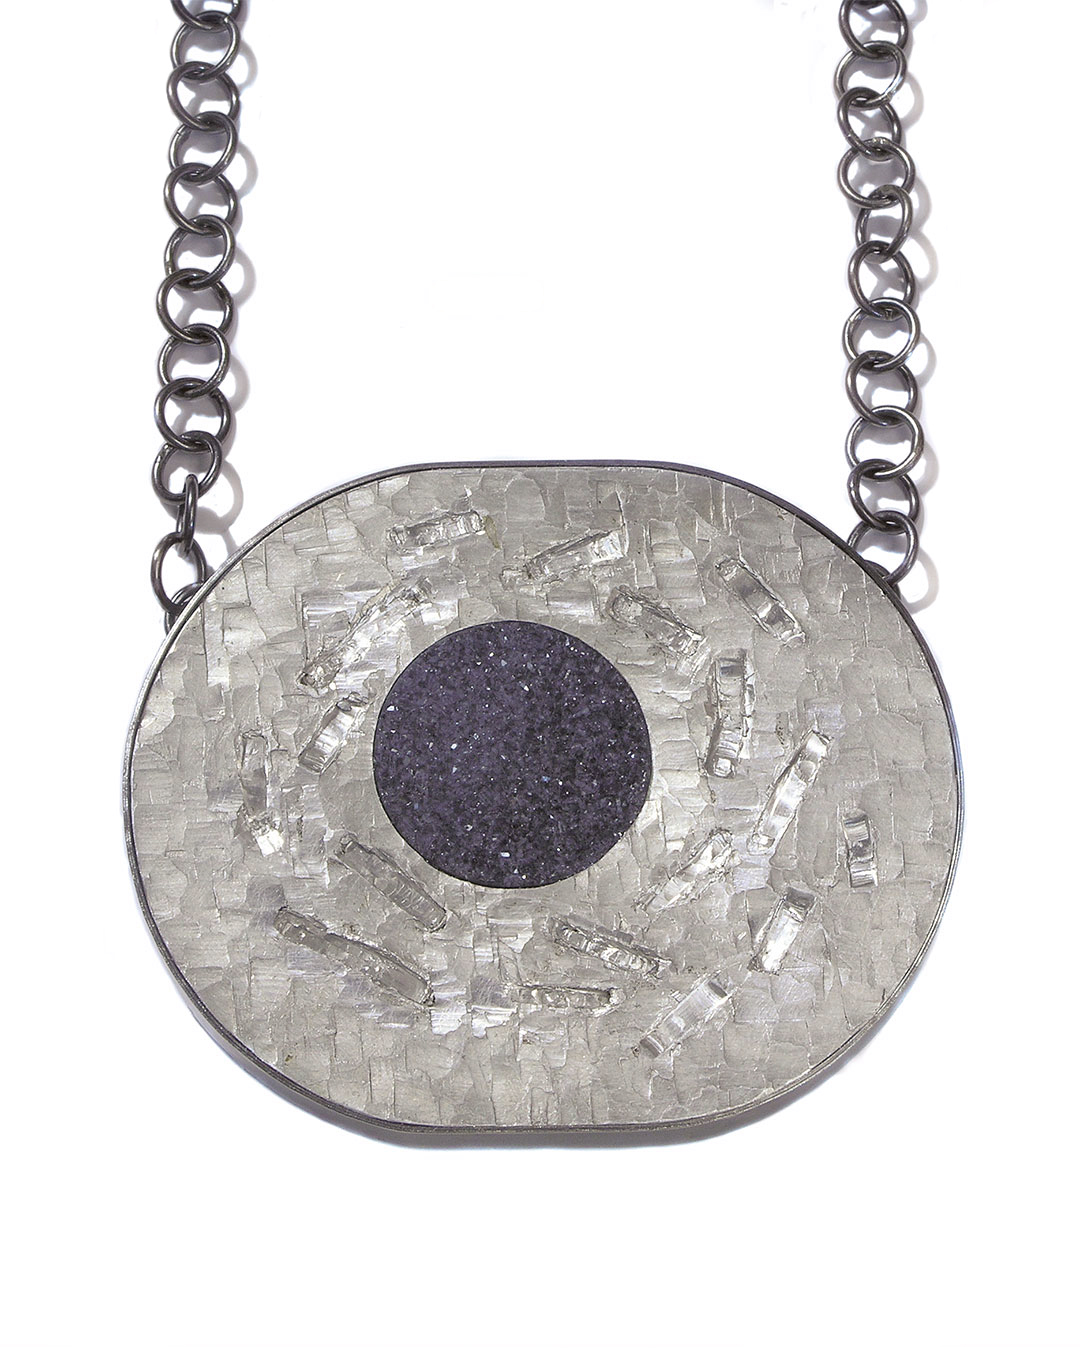 Sybille Richter, See, halssieraad, 2008. Foto Galerie Marzee, zilver, agaat, aluminium